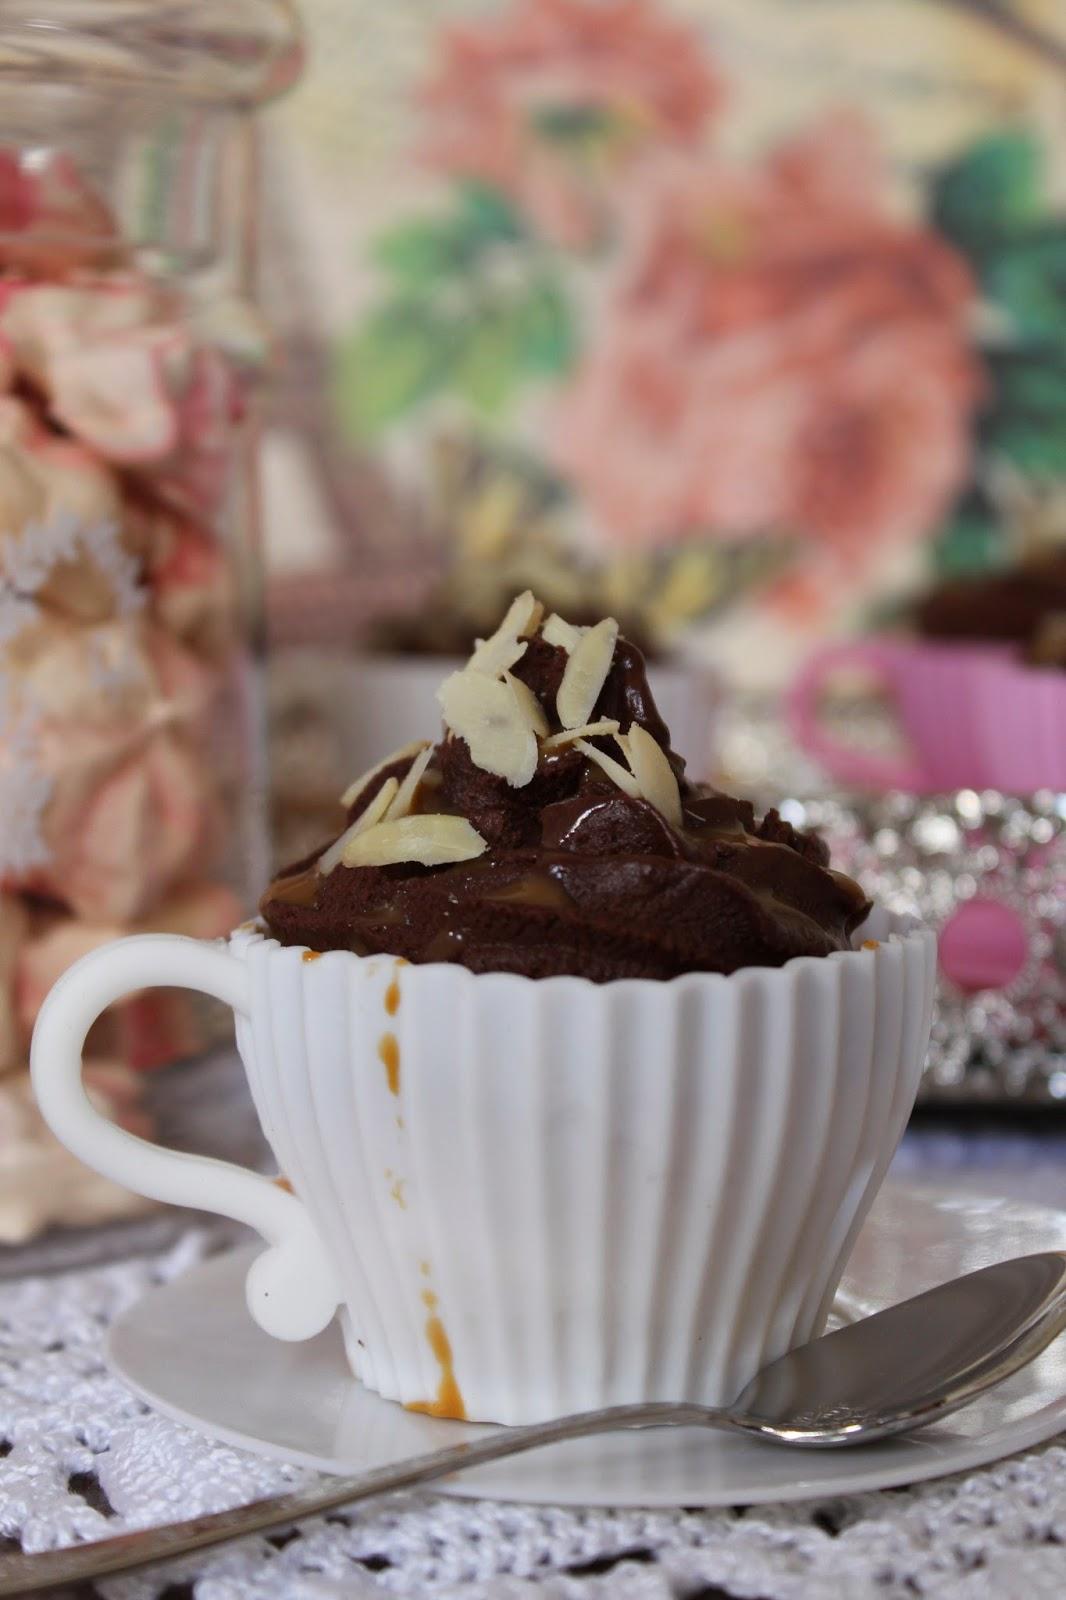 cupcake-taza-de-chocolate-y-dulce-de-leche